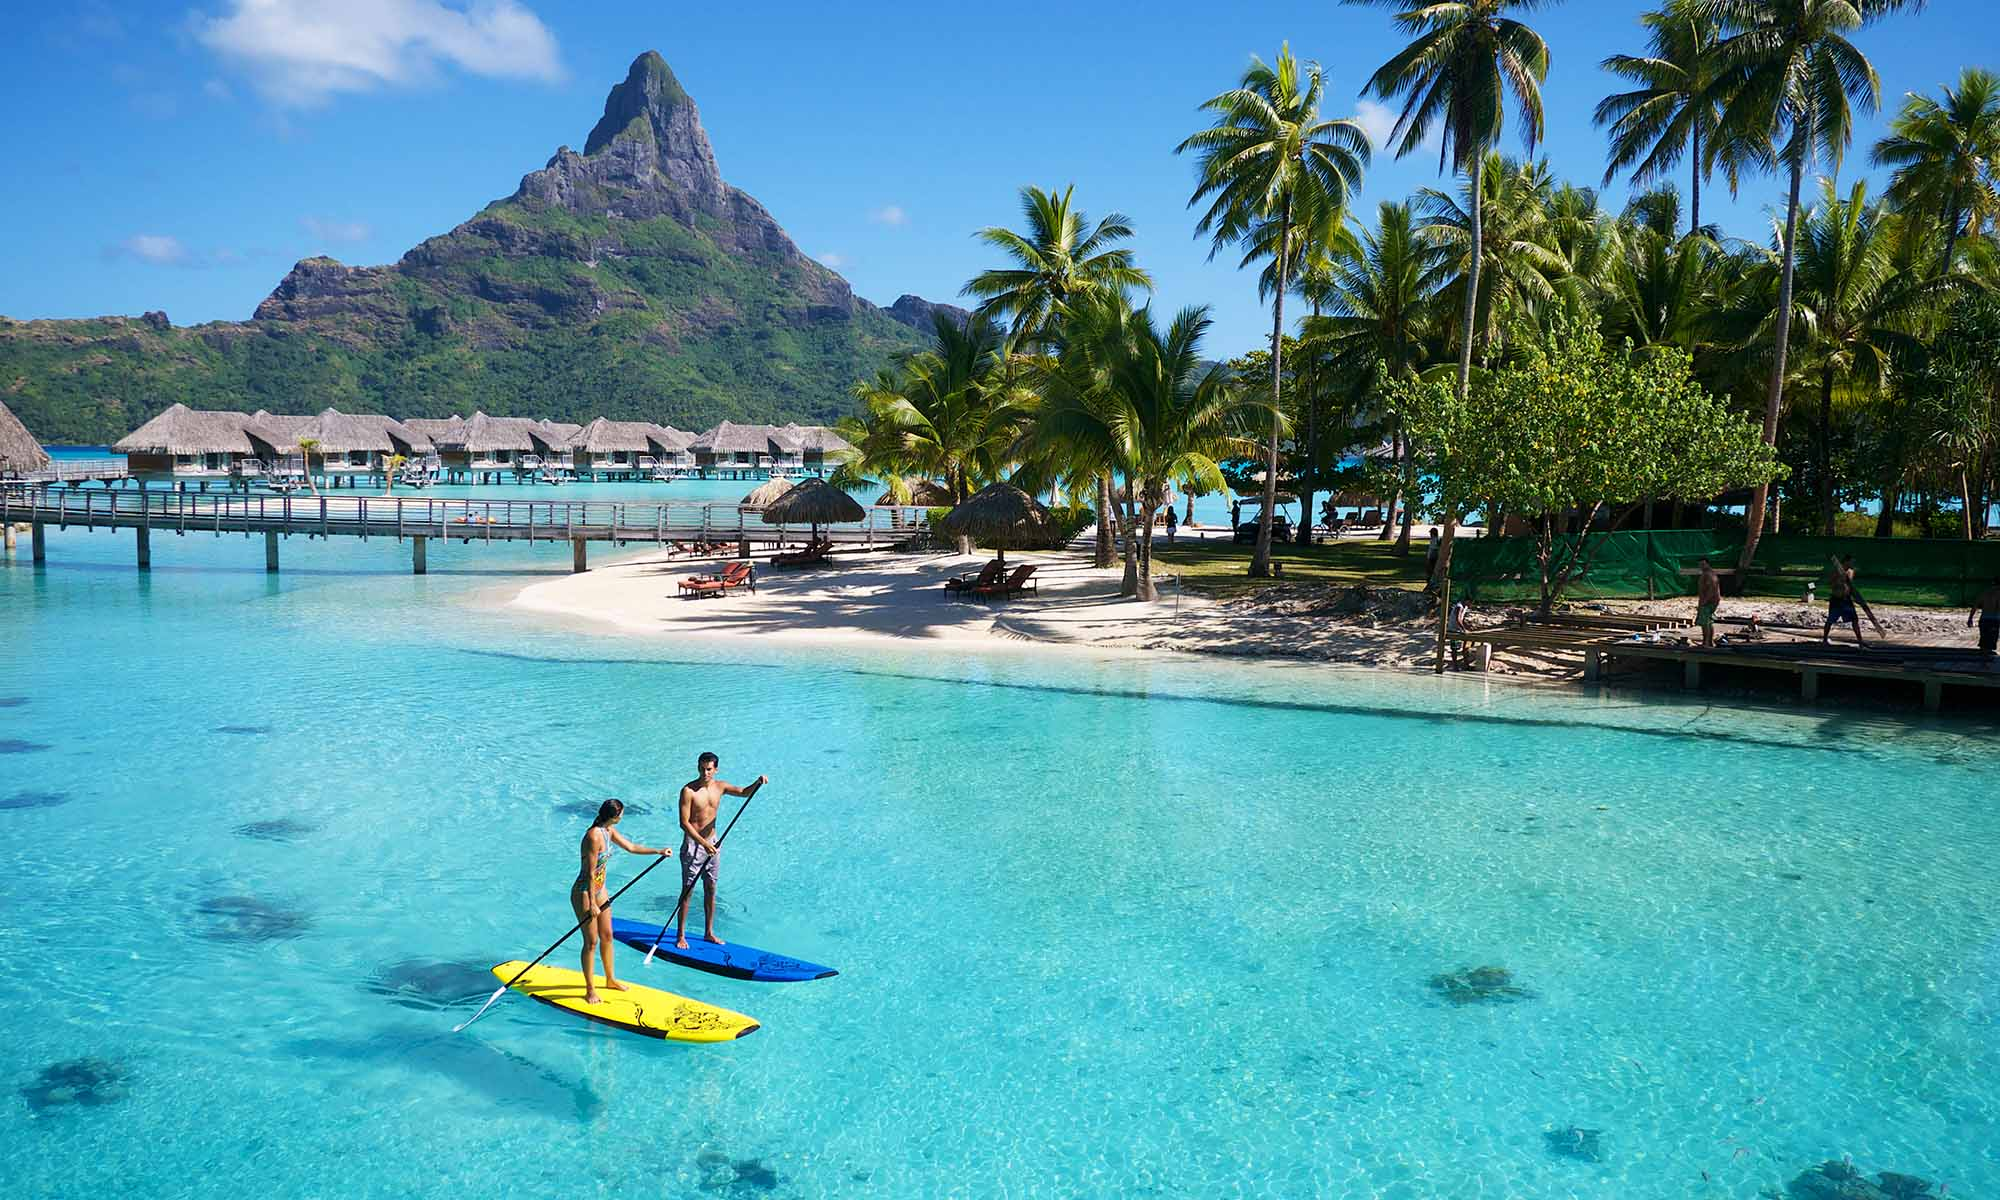 What to Do When In Bora Bora  Bora Bora Travel, Travel, Travel Ideas, Fun in Bora Bora, What to Do In Bora #Travel #BoraBora